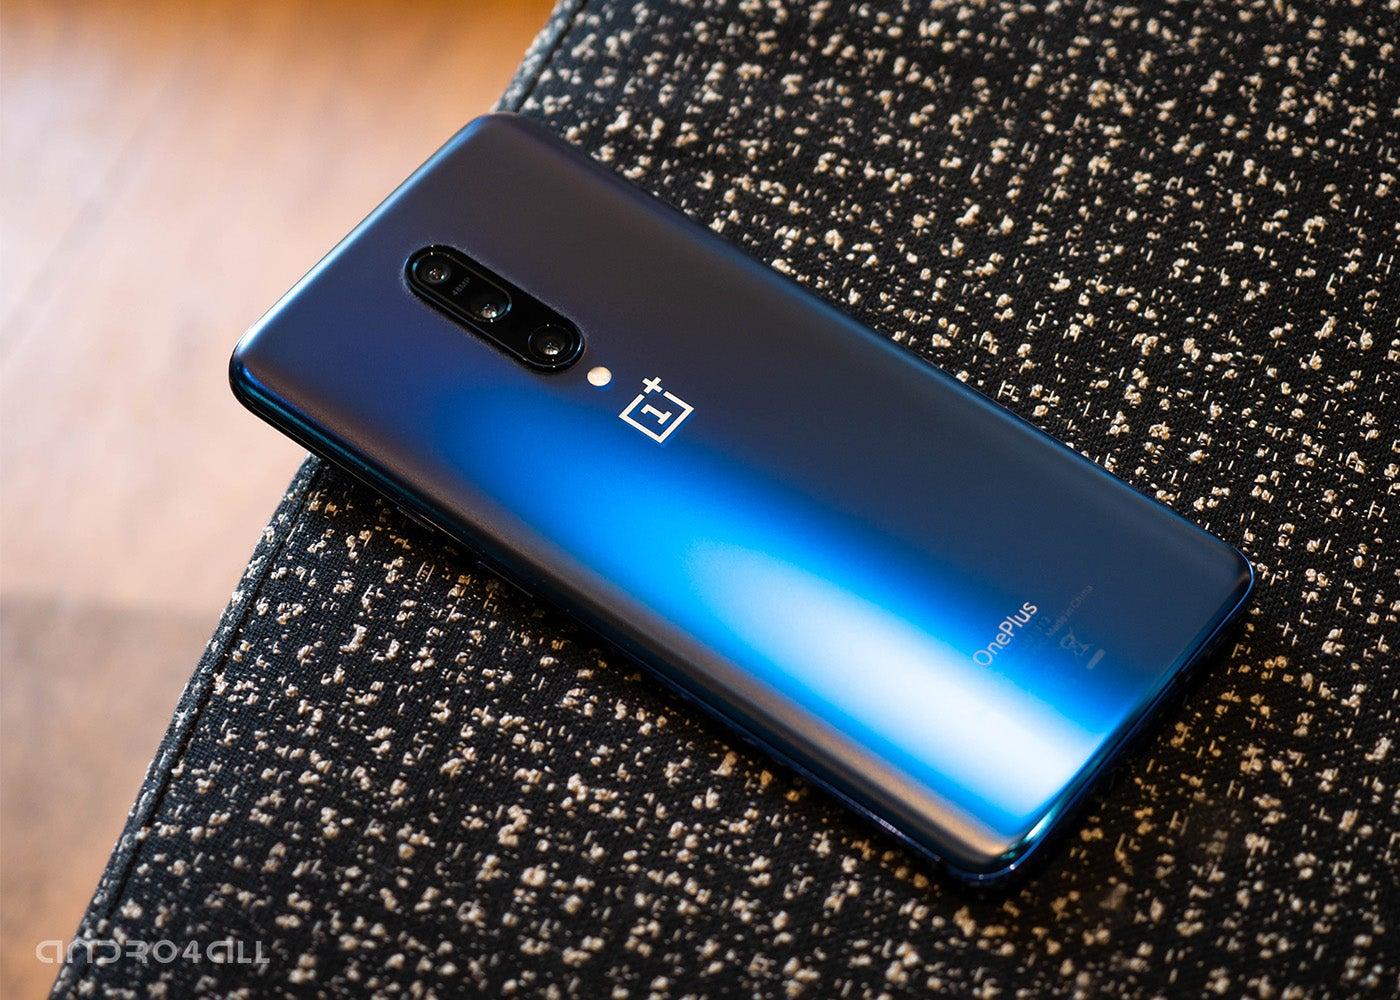 OnePlus 7 Pro, blue back